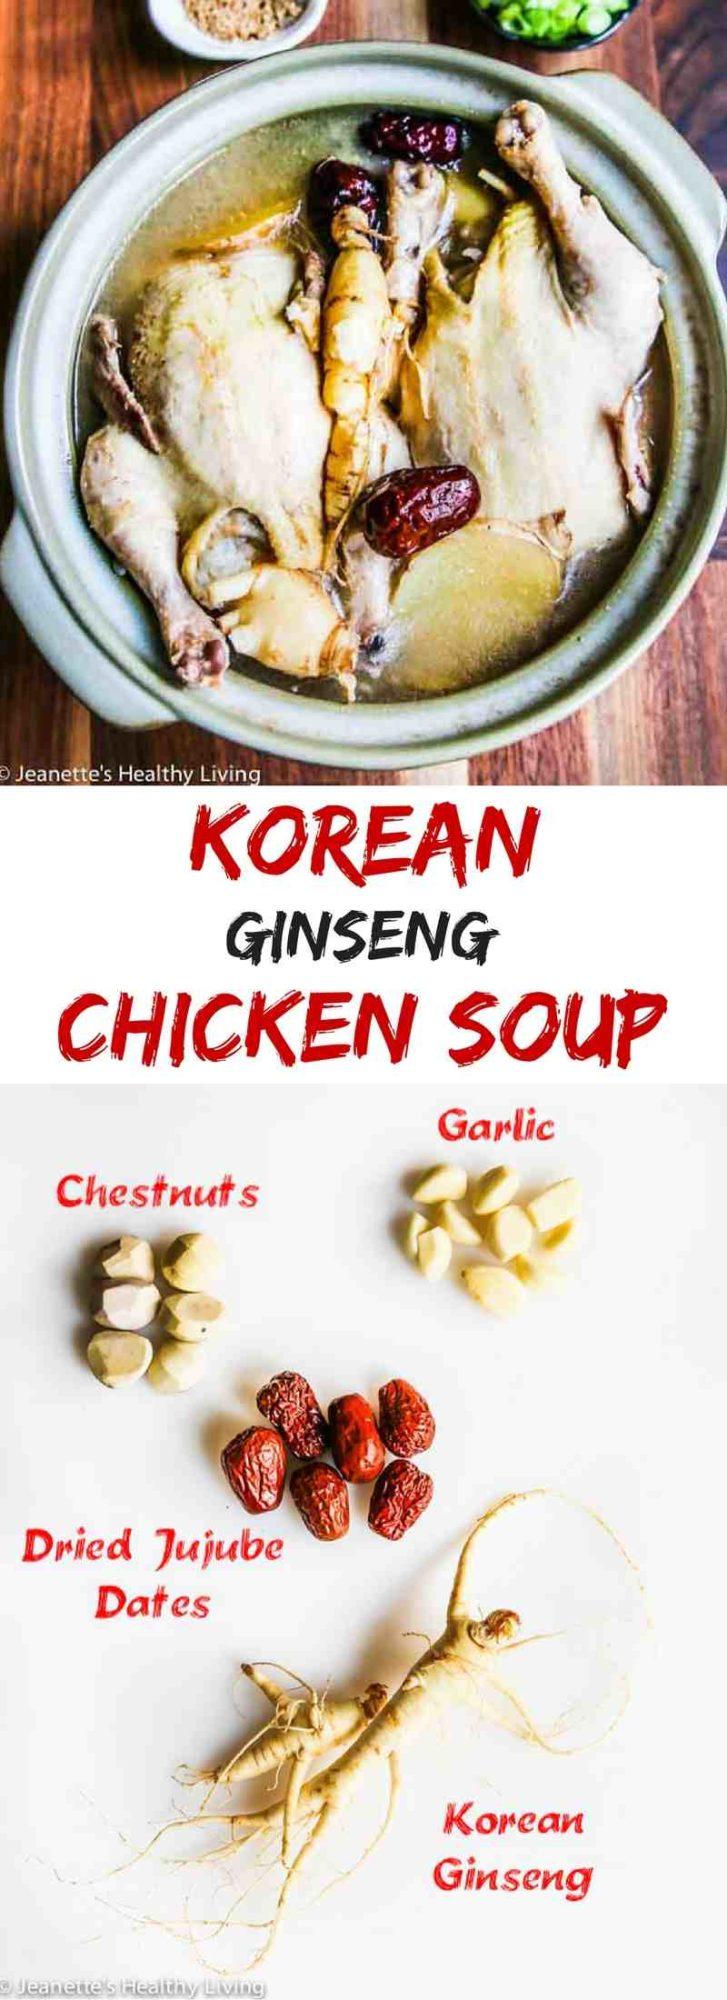 Korean Chicken Ginseng Soup - a nourishing, rejuvenating chicken soup made with Korean ginseng